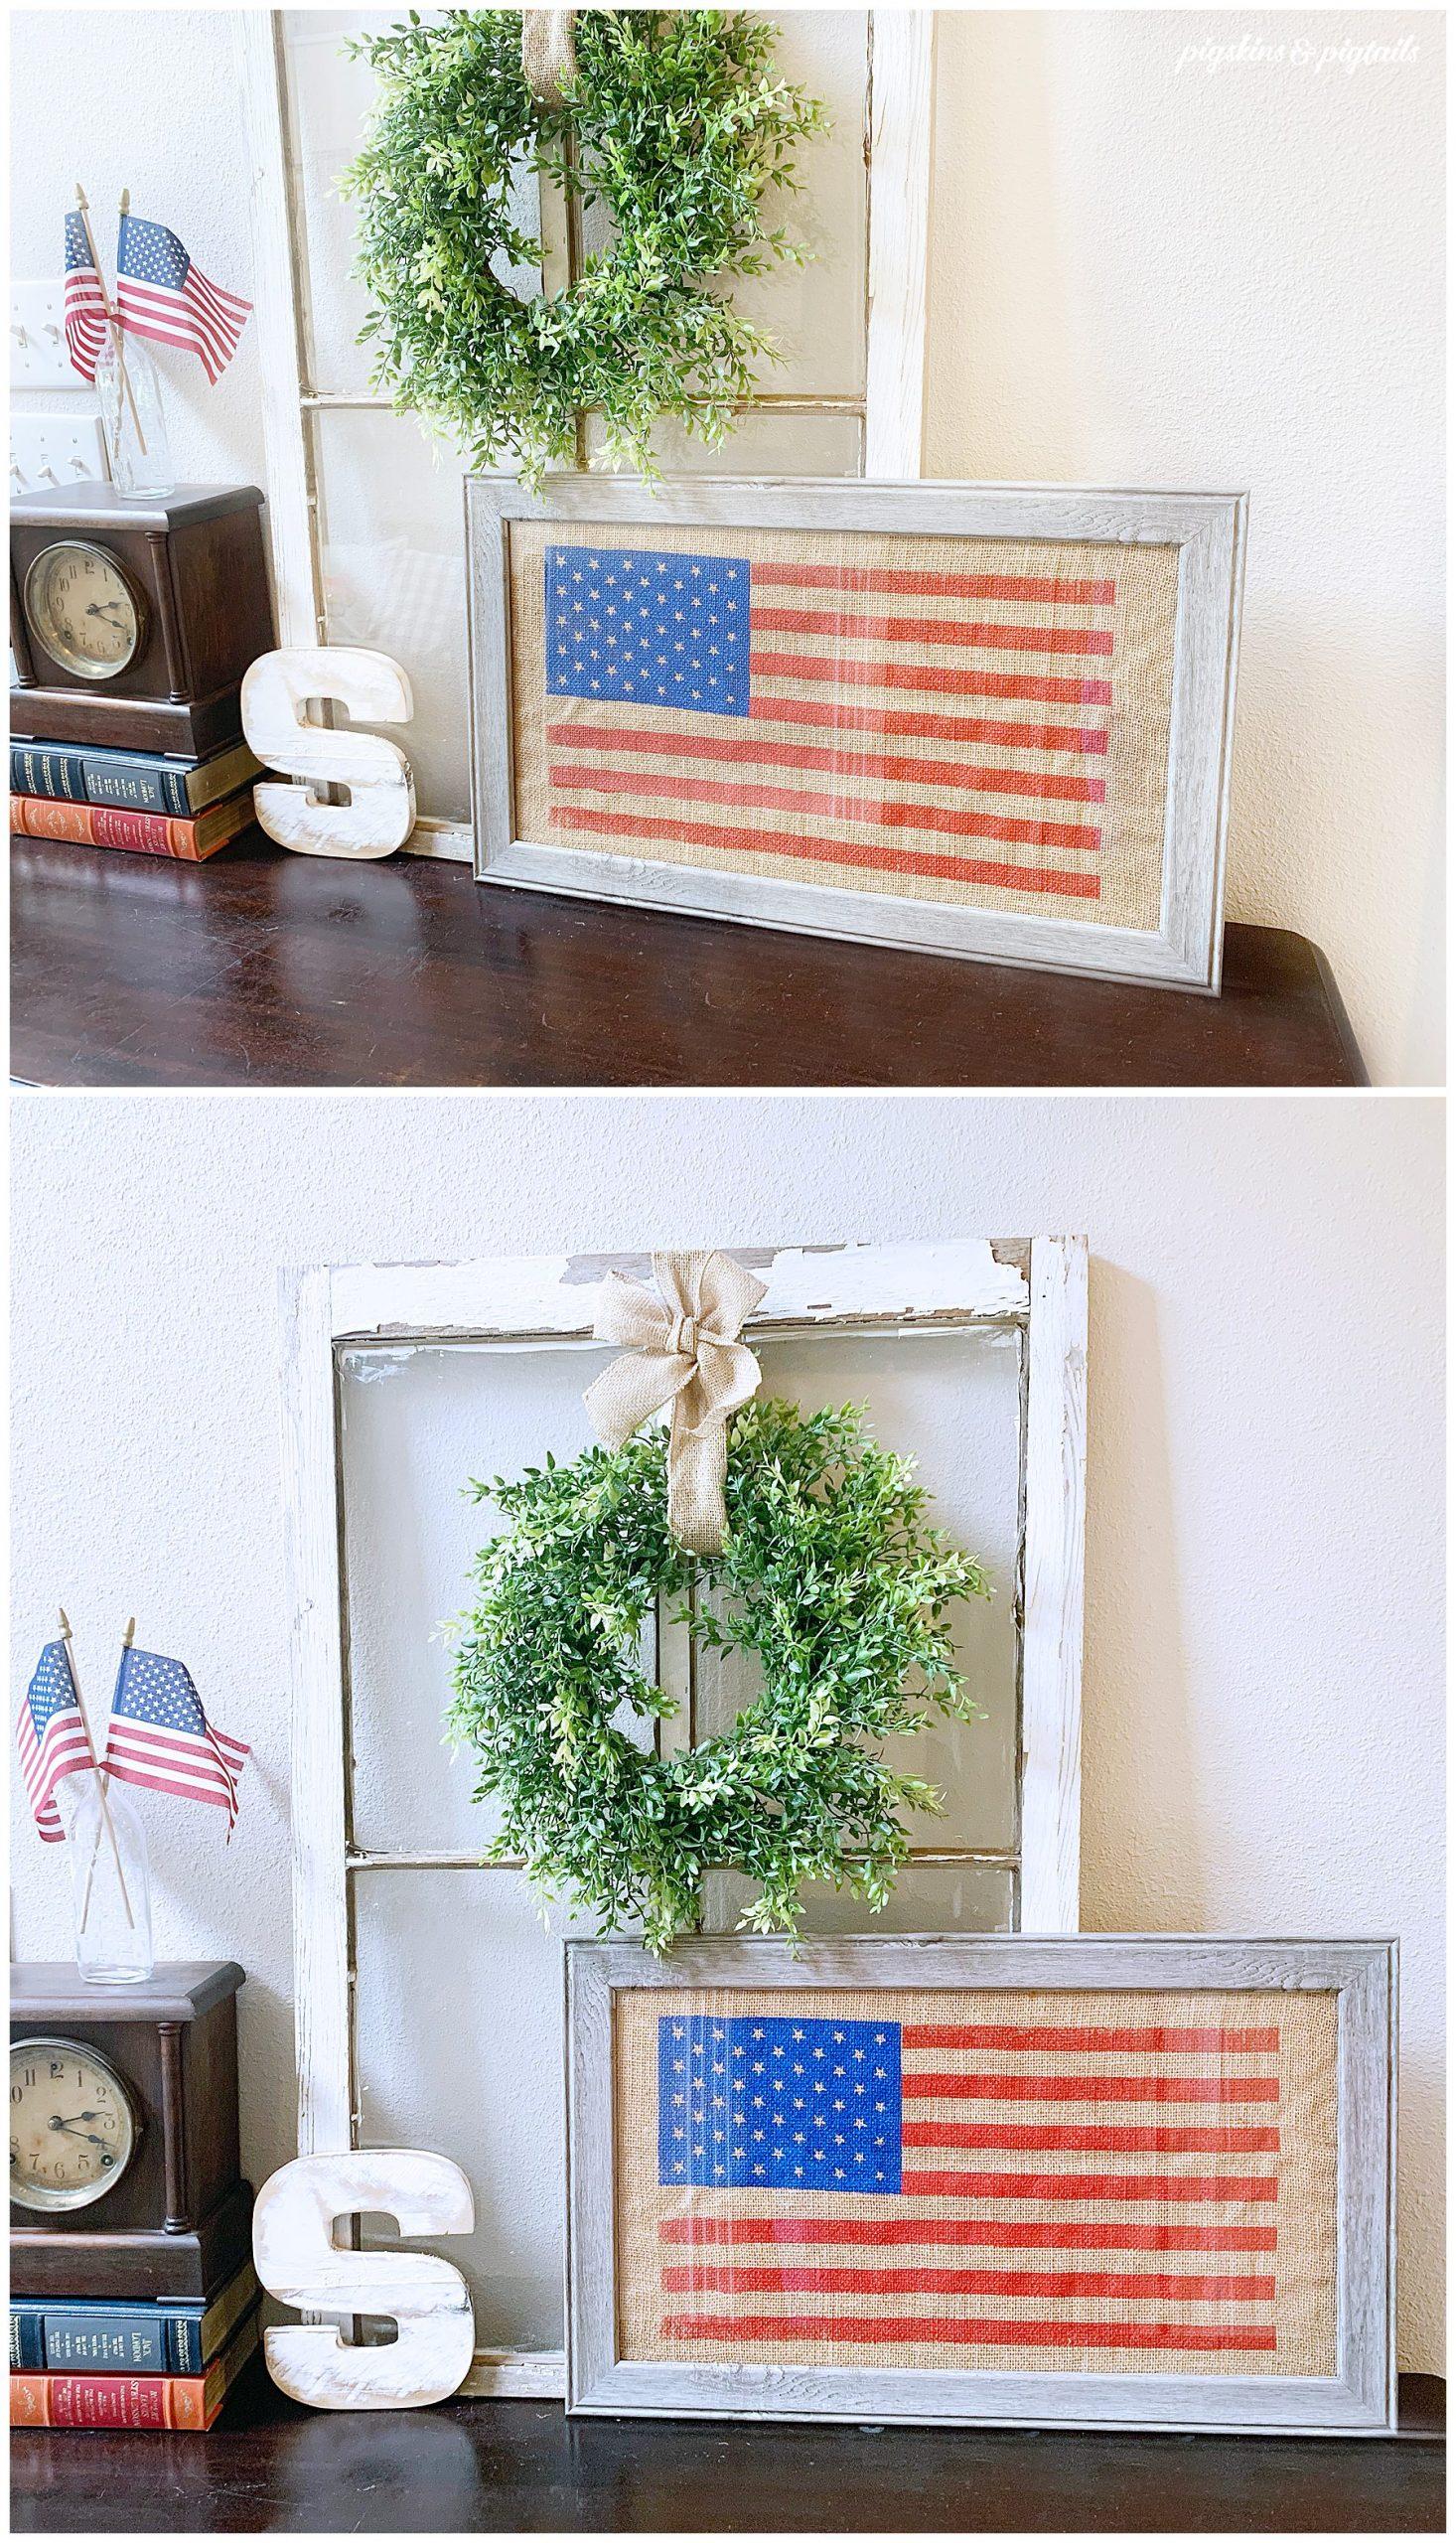 patriotic decor diy screen printing framed burlap flag